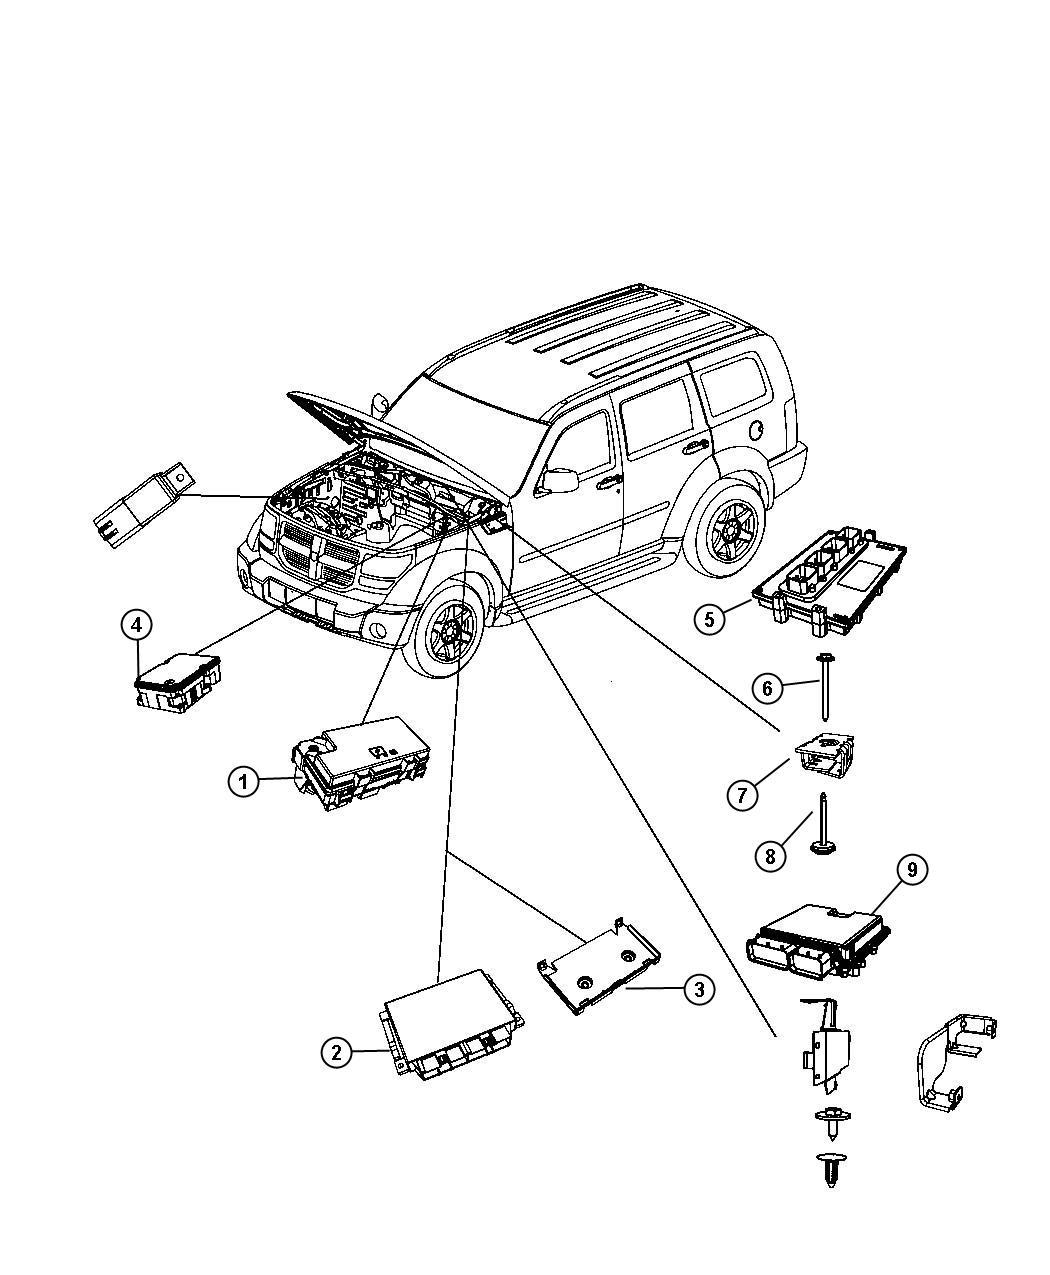 Dodge Nitro Module. Powertrain control. Generic